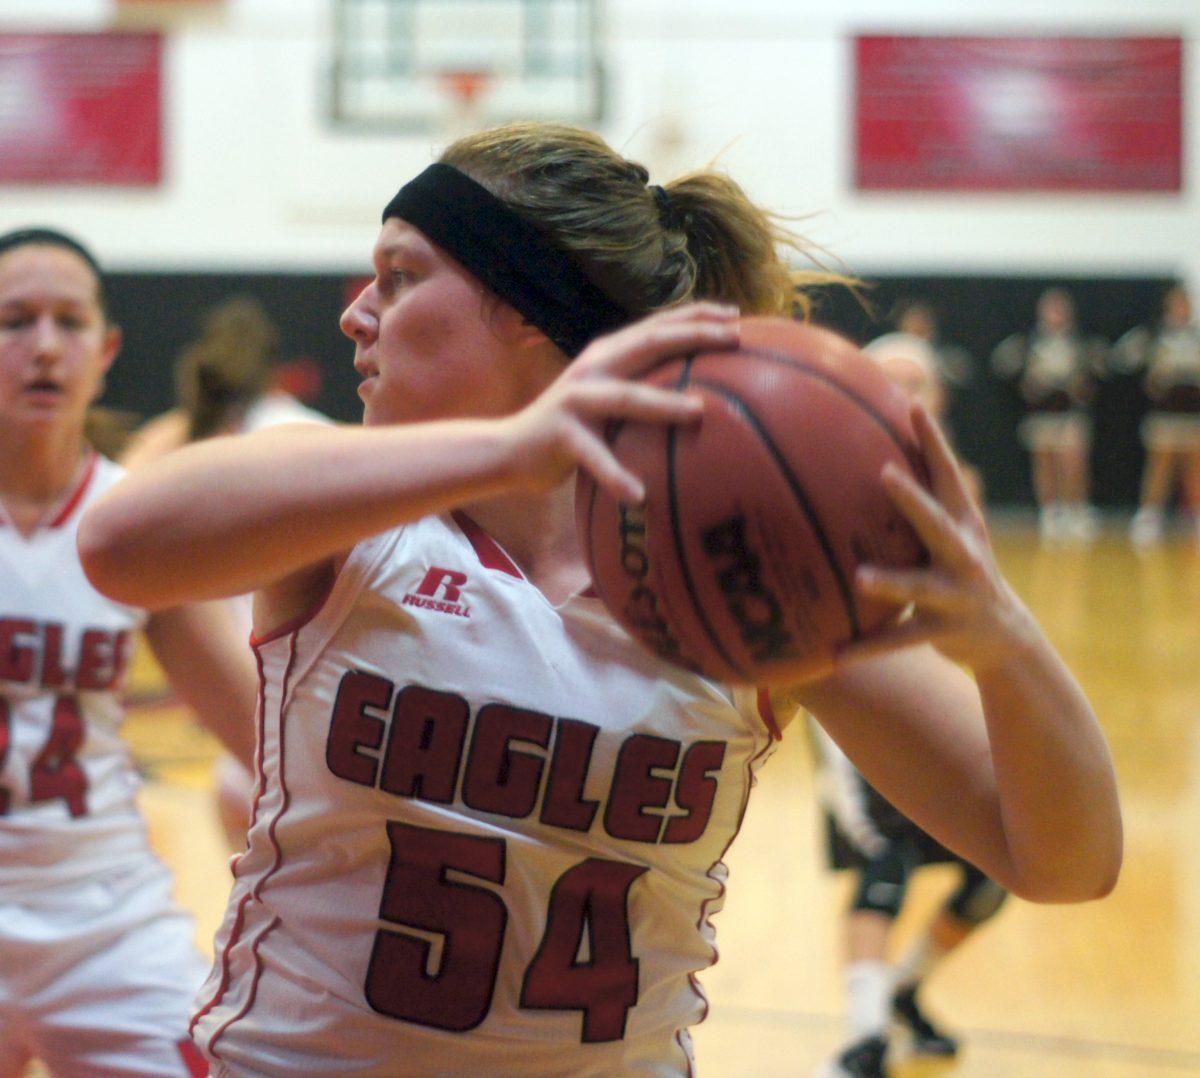 Sarah Dooley pulling down a rebound at Highland.